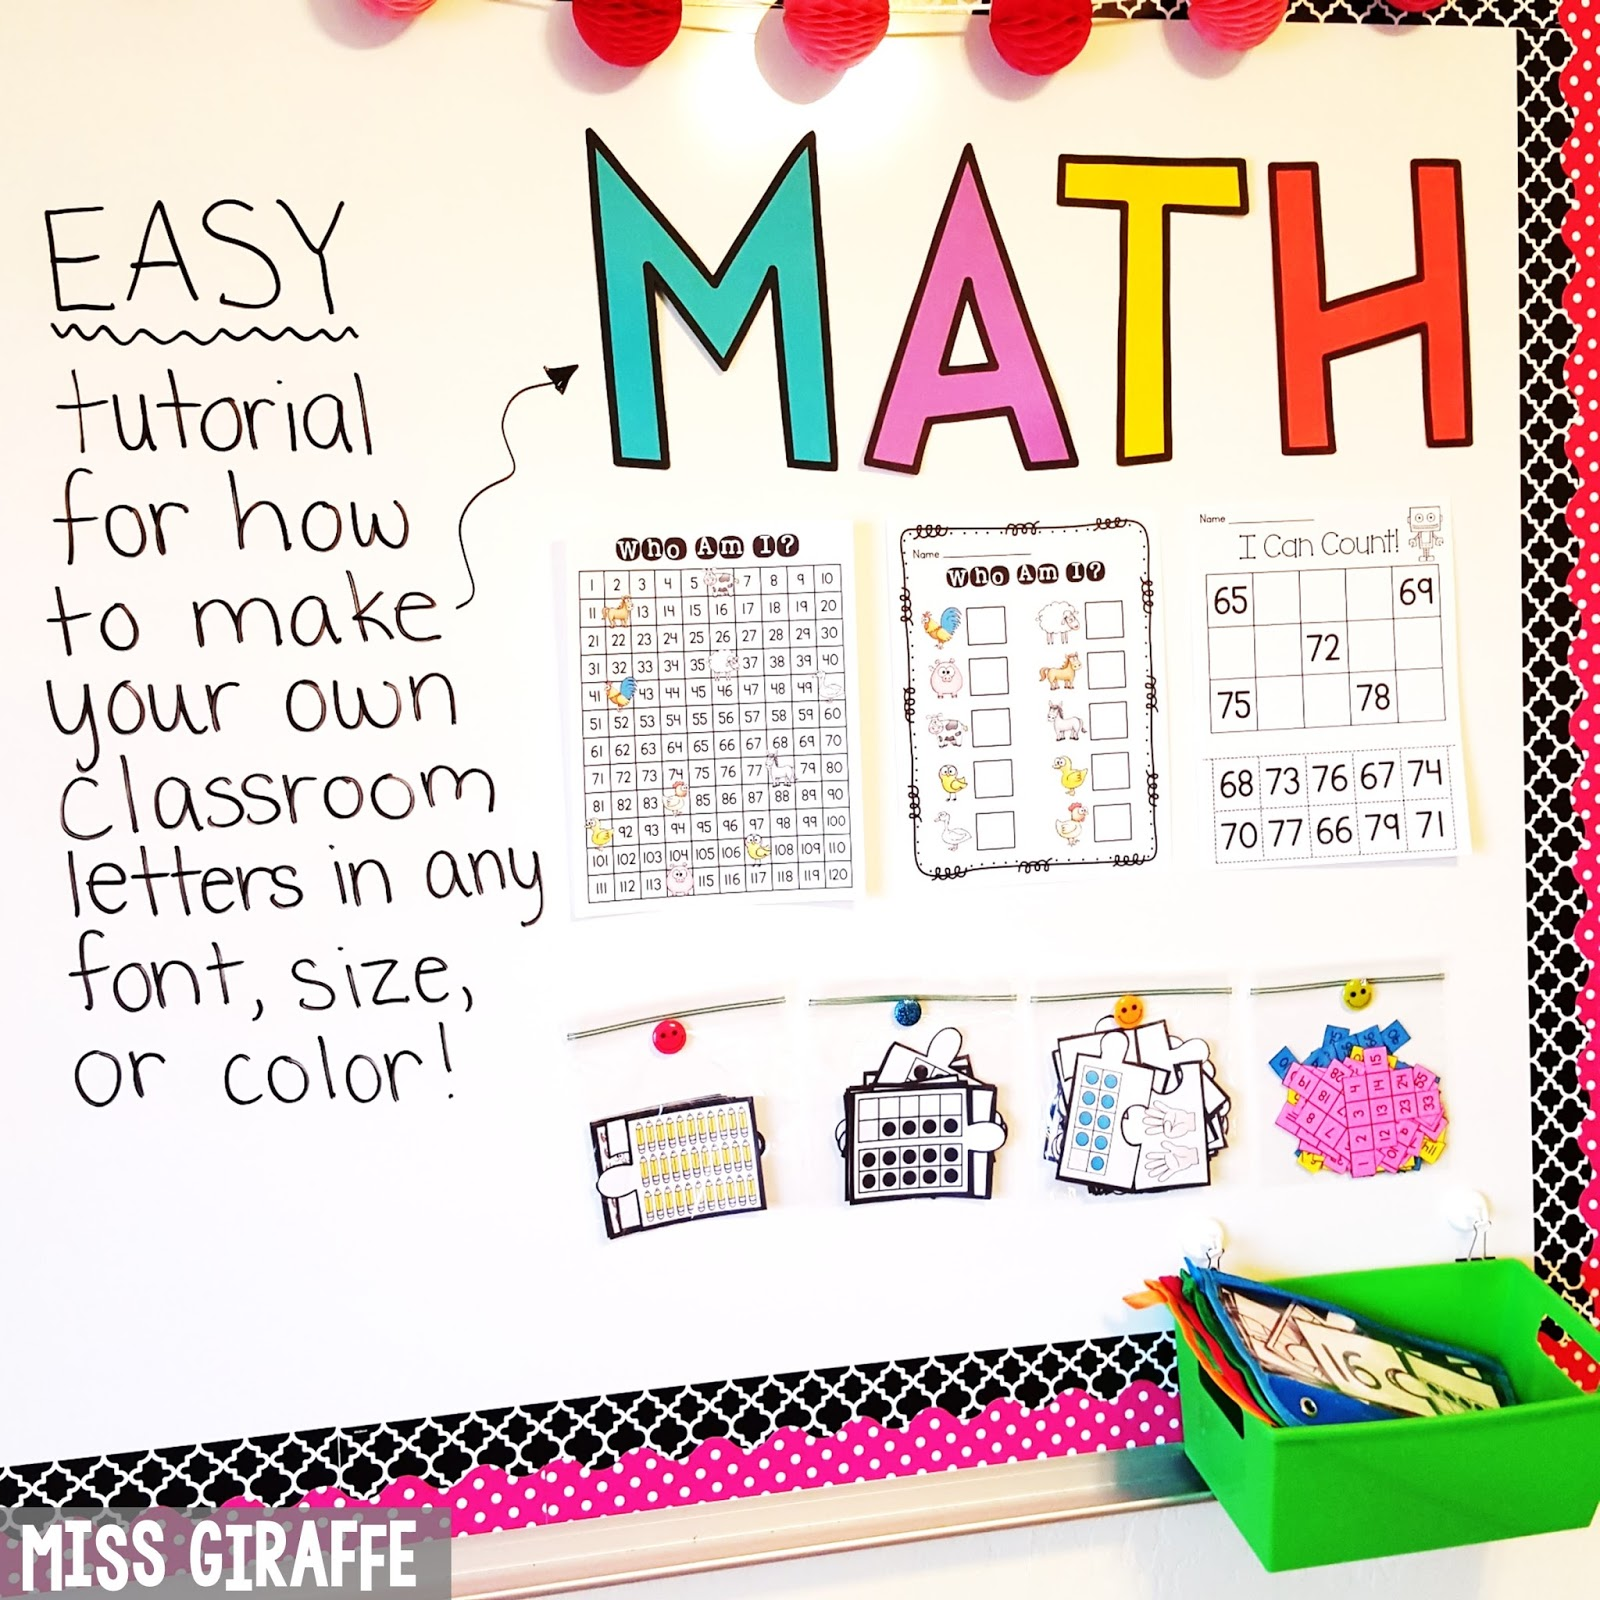 Classroom Decor Ideas Diy ~ Miss giraffe s class diy classroom decor bulletin board